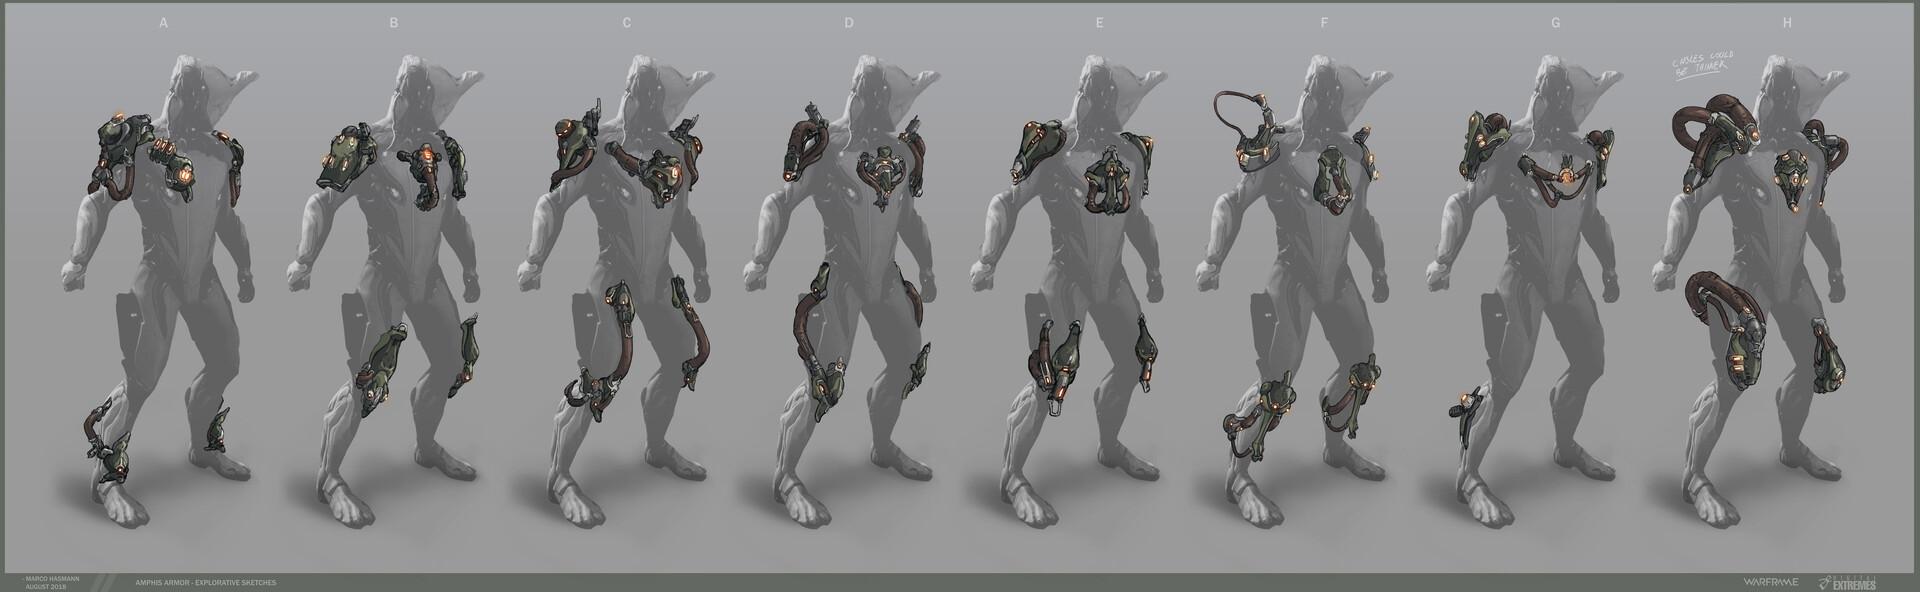 Marco hasmann mh amphis armor sketches